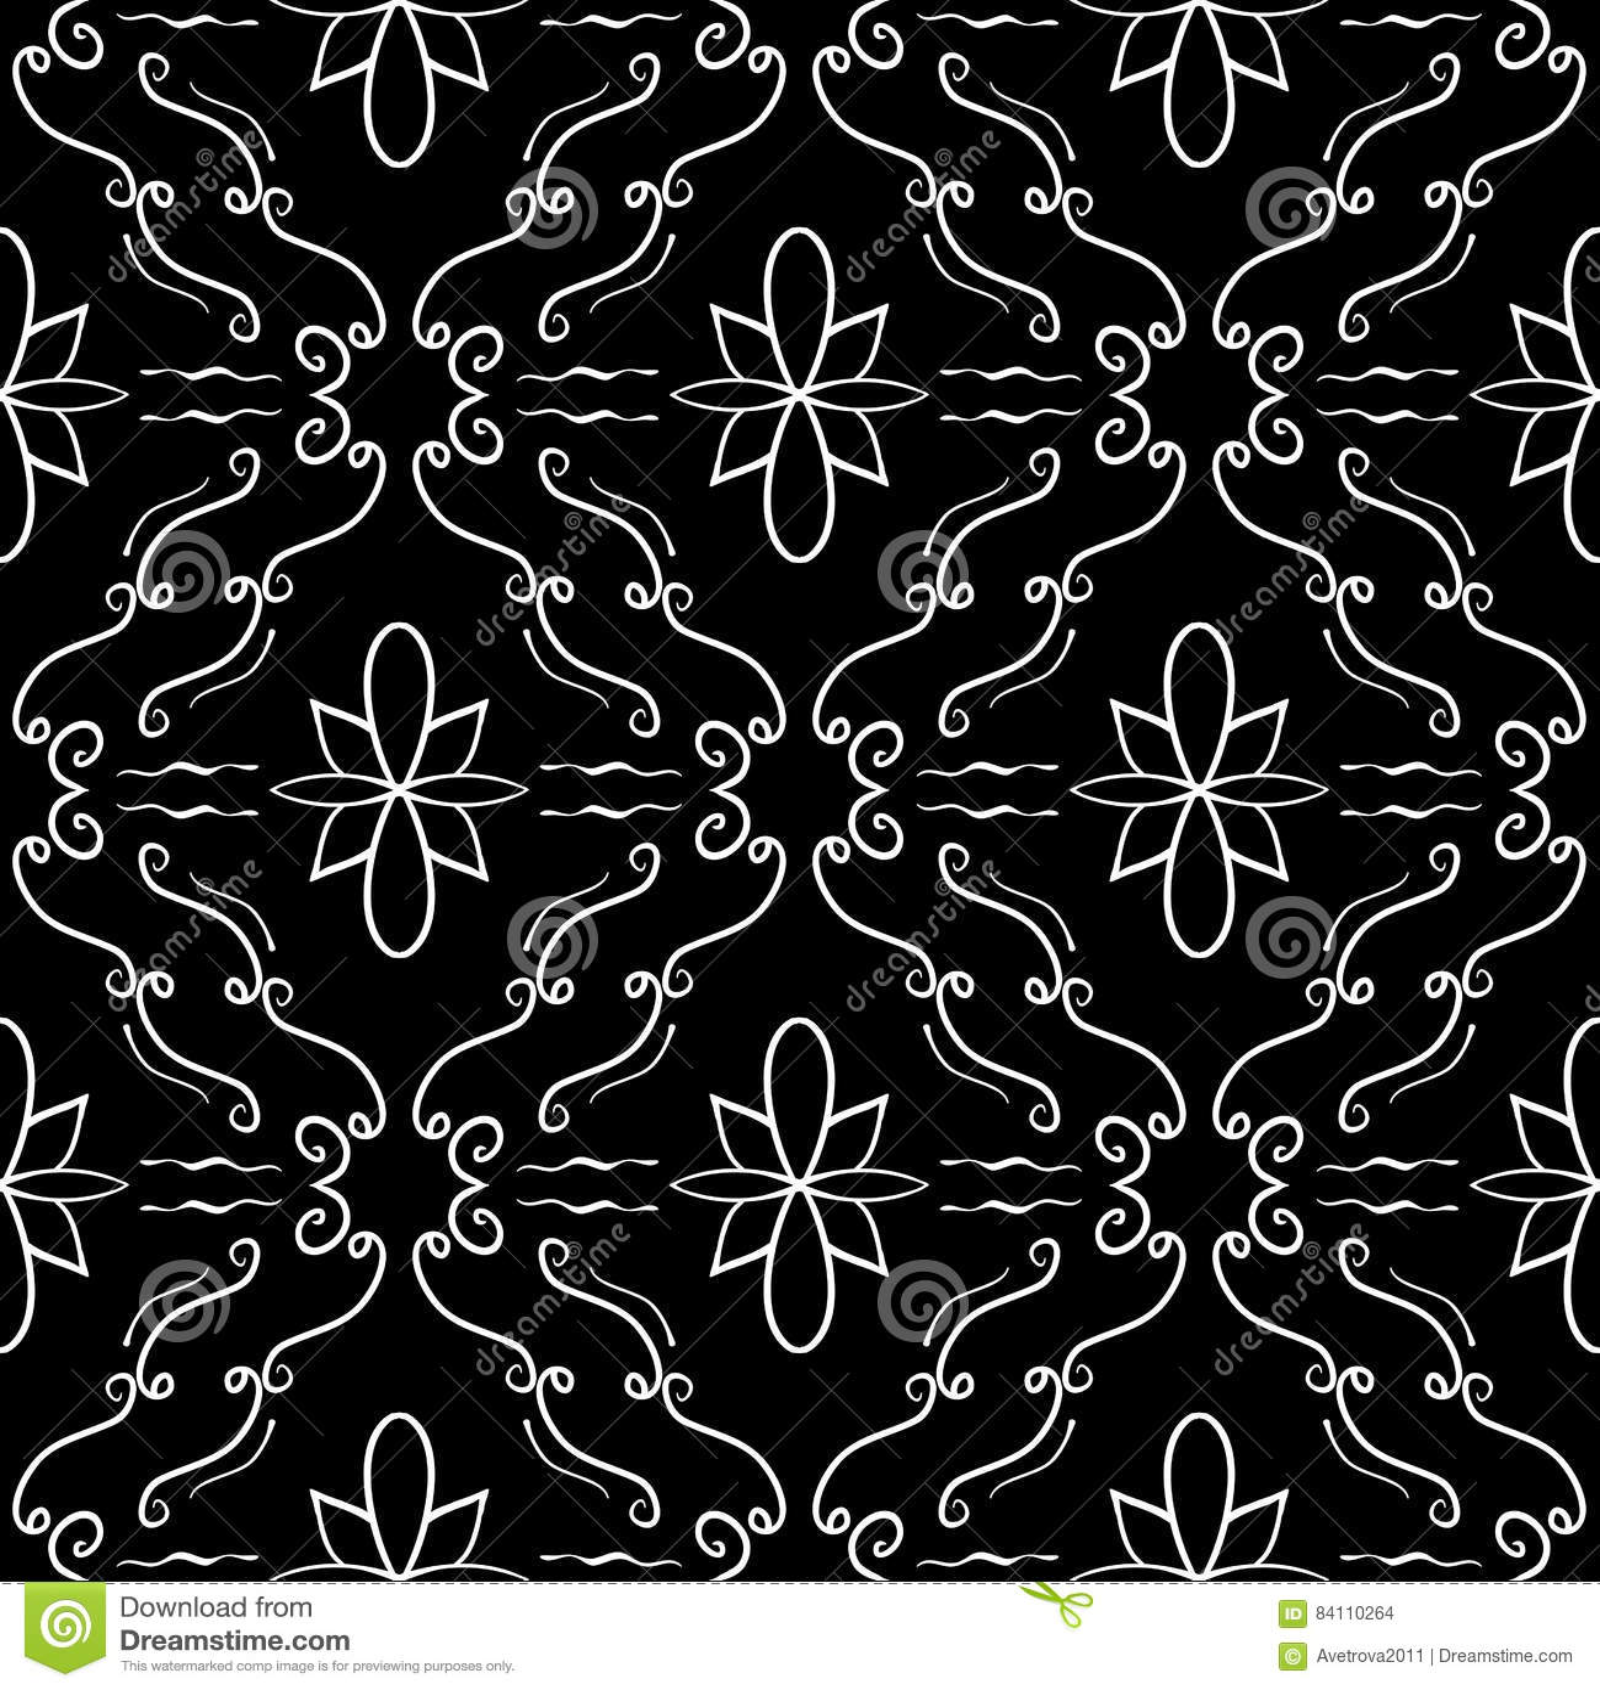 elegant flourish seamless pattern white curved lines on black